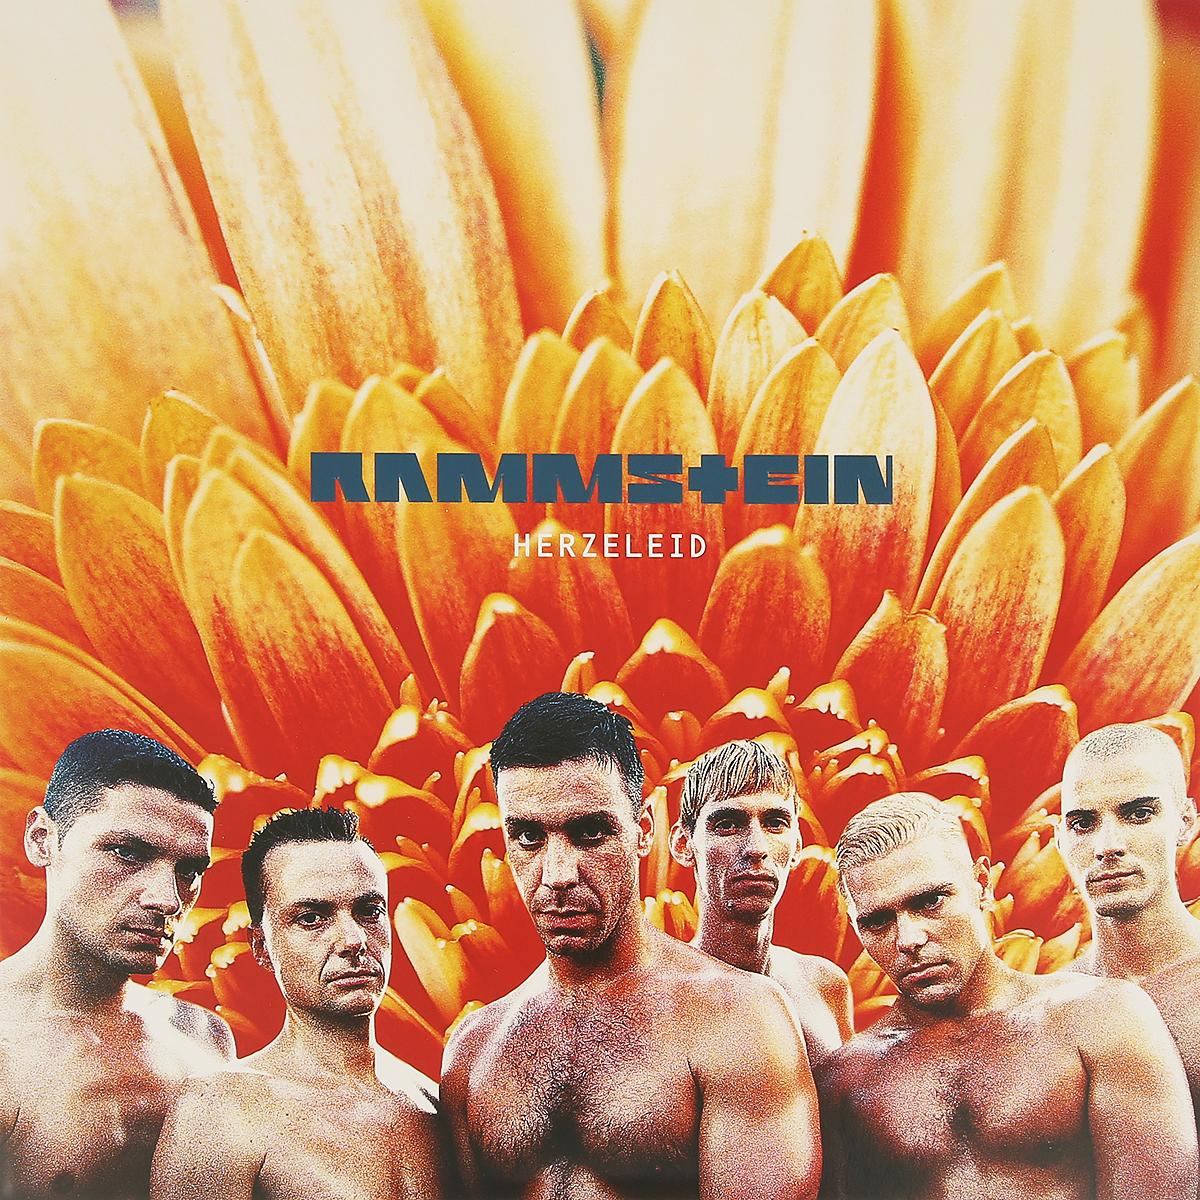 цена на Rammstein Rammstein. Herzeleid (2 LP)